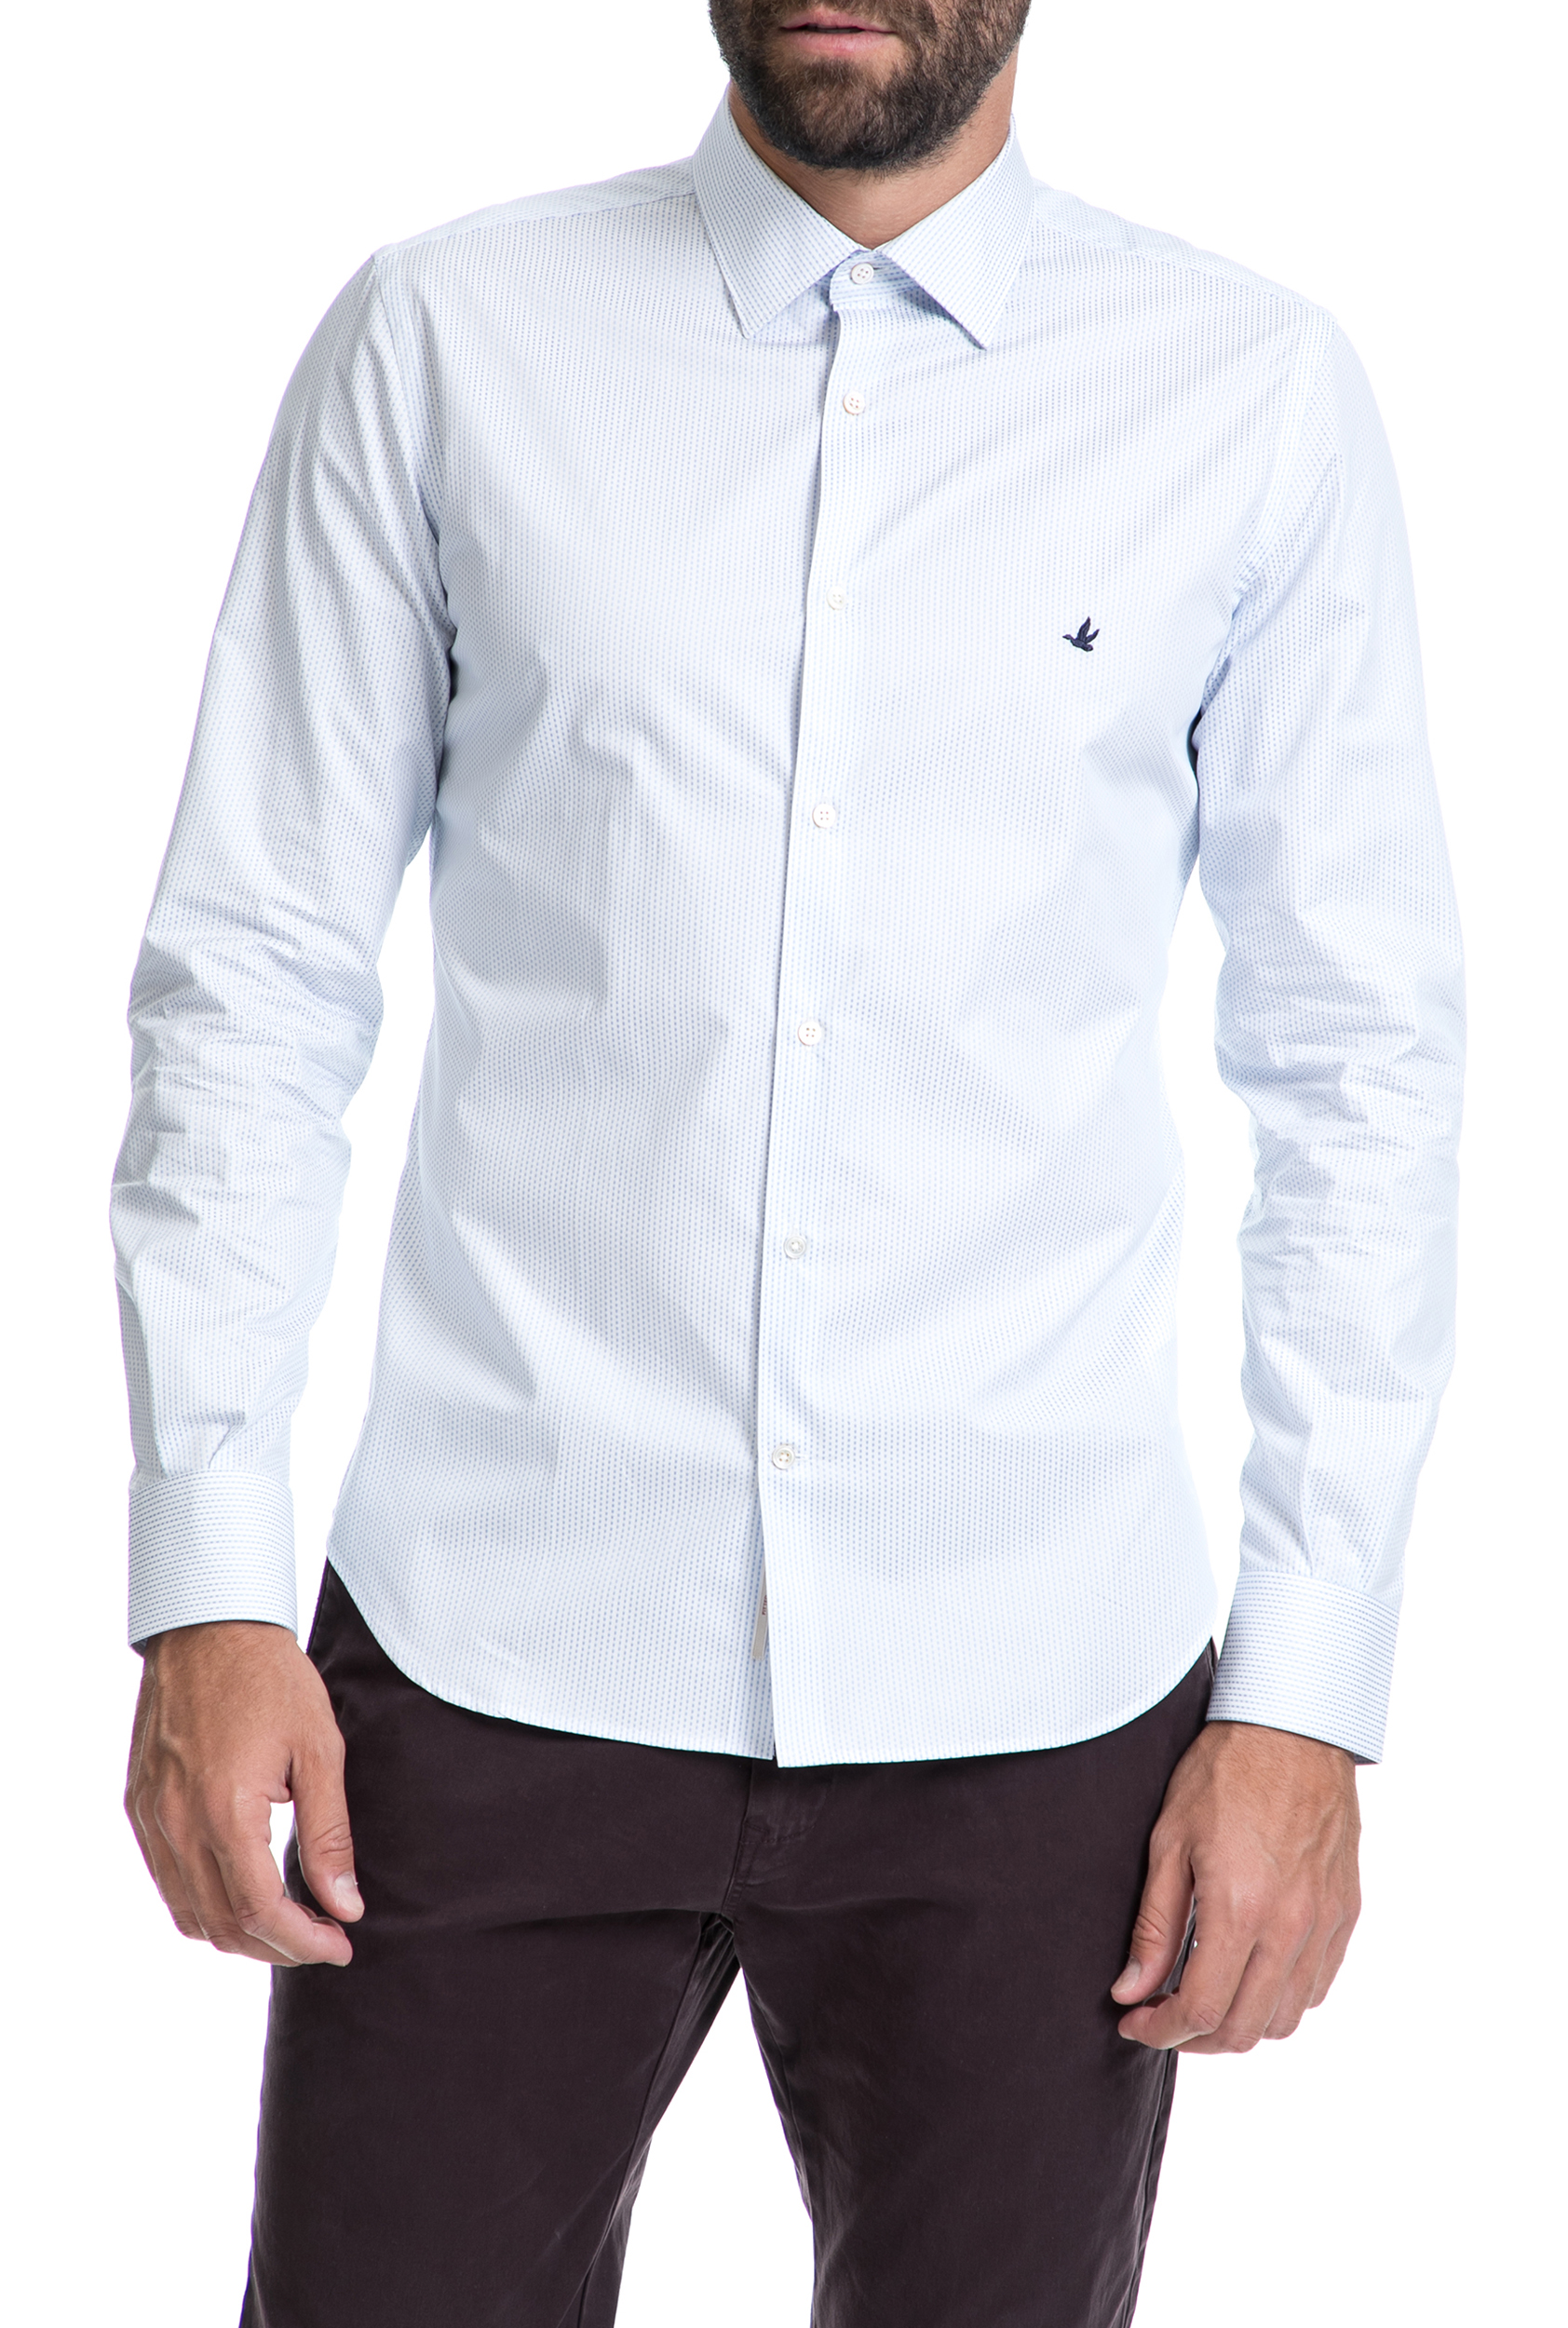 4bf3ff66a321 CollectiveOnline BROOKSFIELD - Αντρικό πουκάμισο BROOKSFIELD άσπρο-μπλε